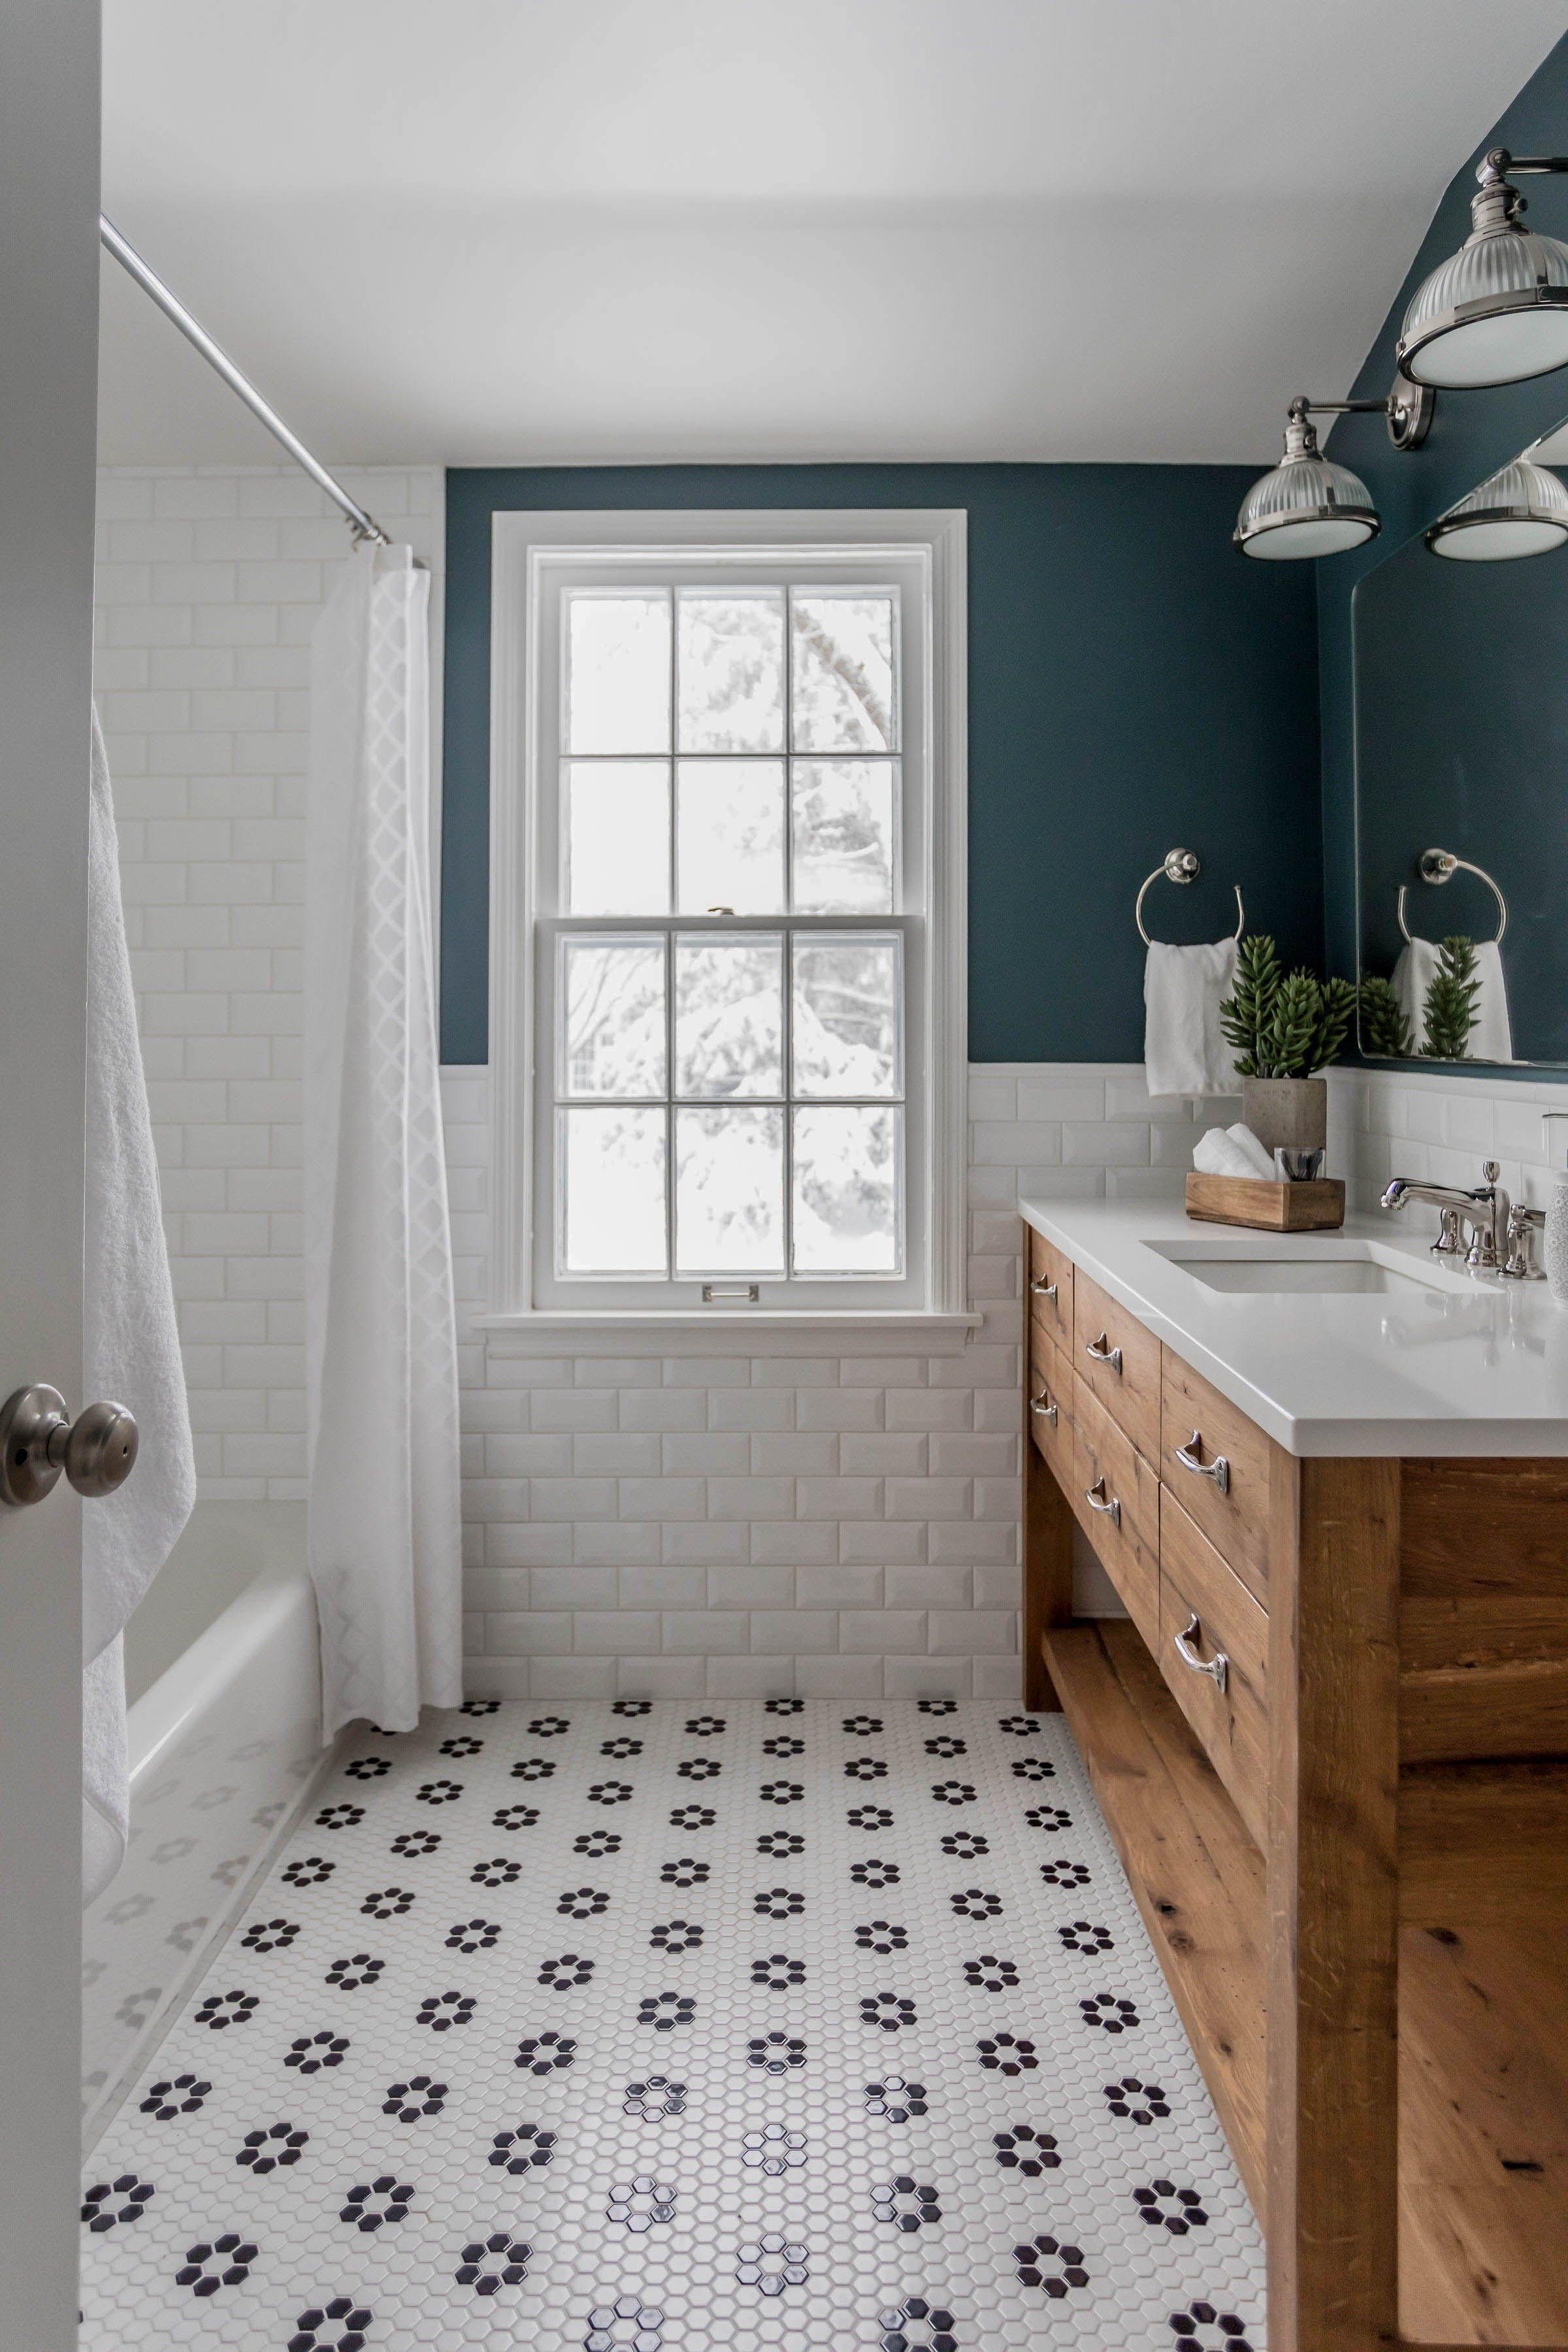 Reclaimed Wood Vanity Black And White Tile Subway Tile Dark Green Bathroom Wa In 2020 Green Bathroom Dark Green Bathrooms Bathrooms Remodel